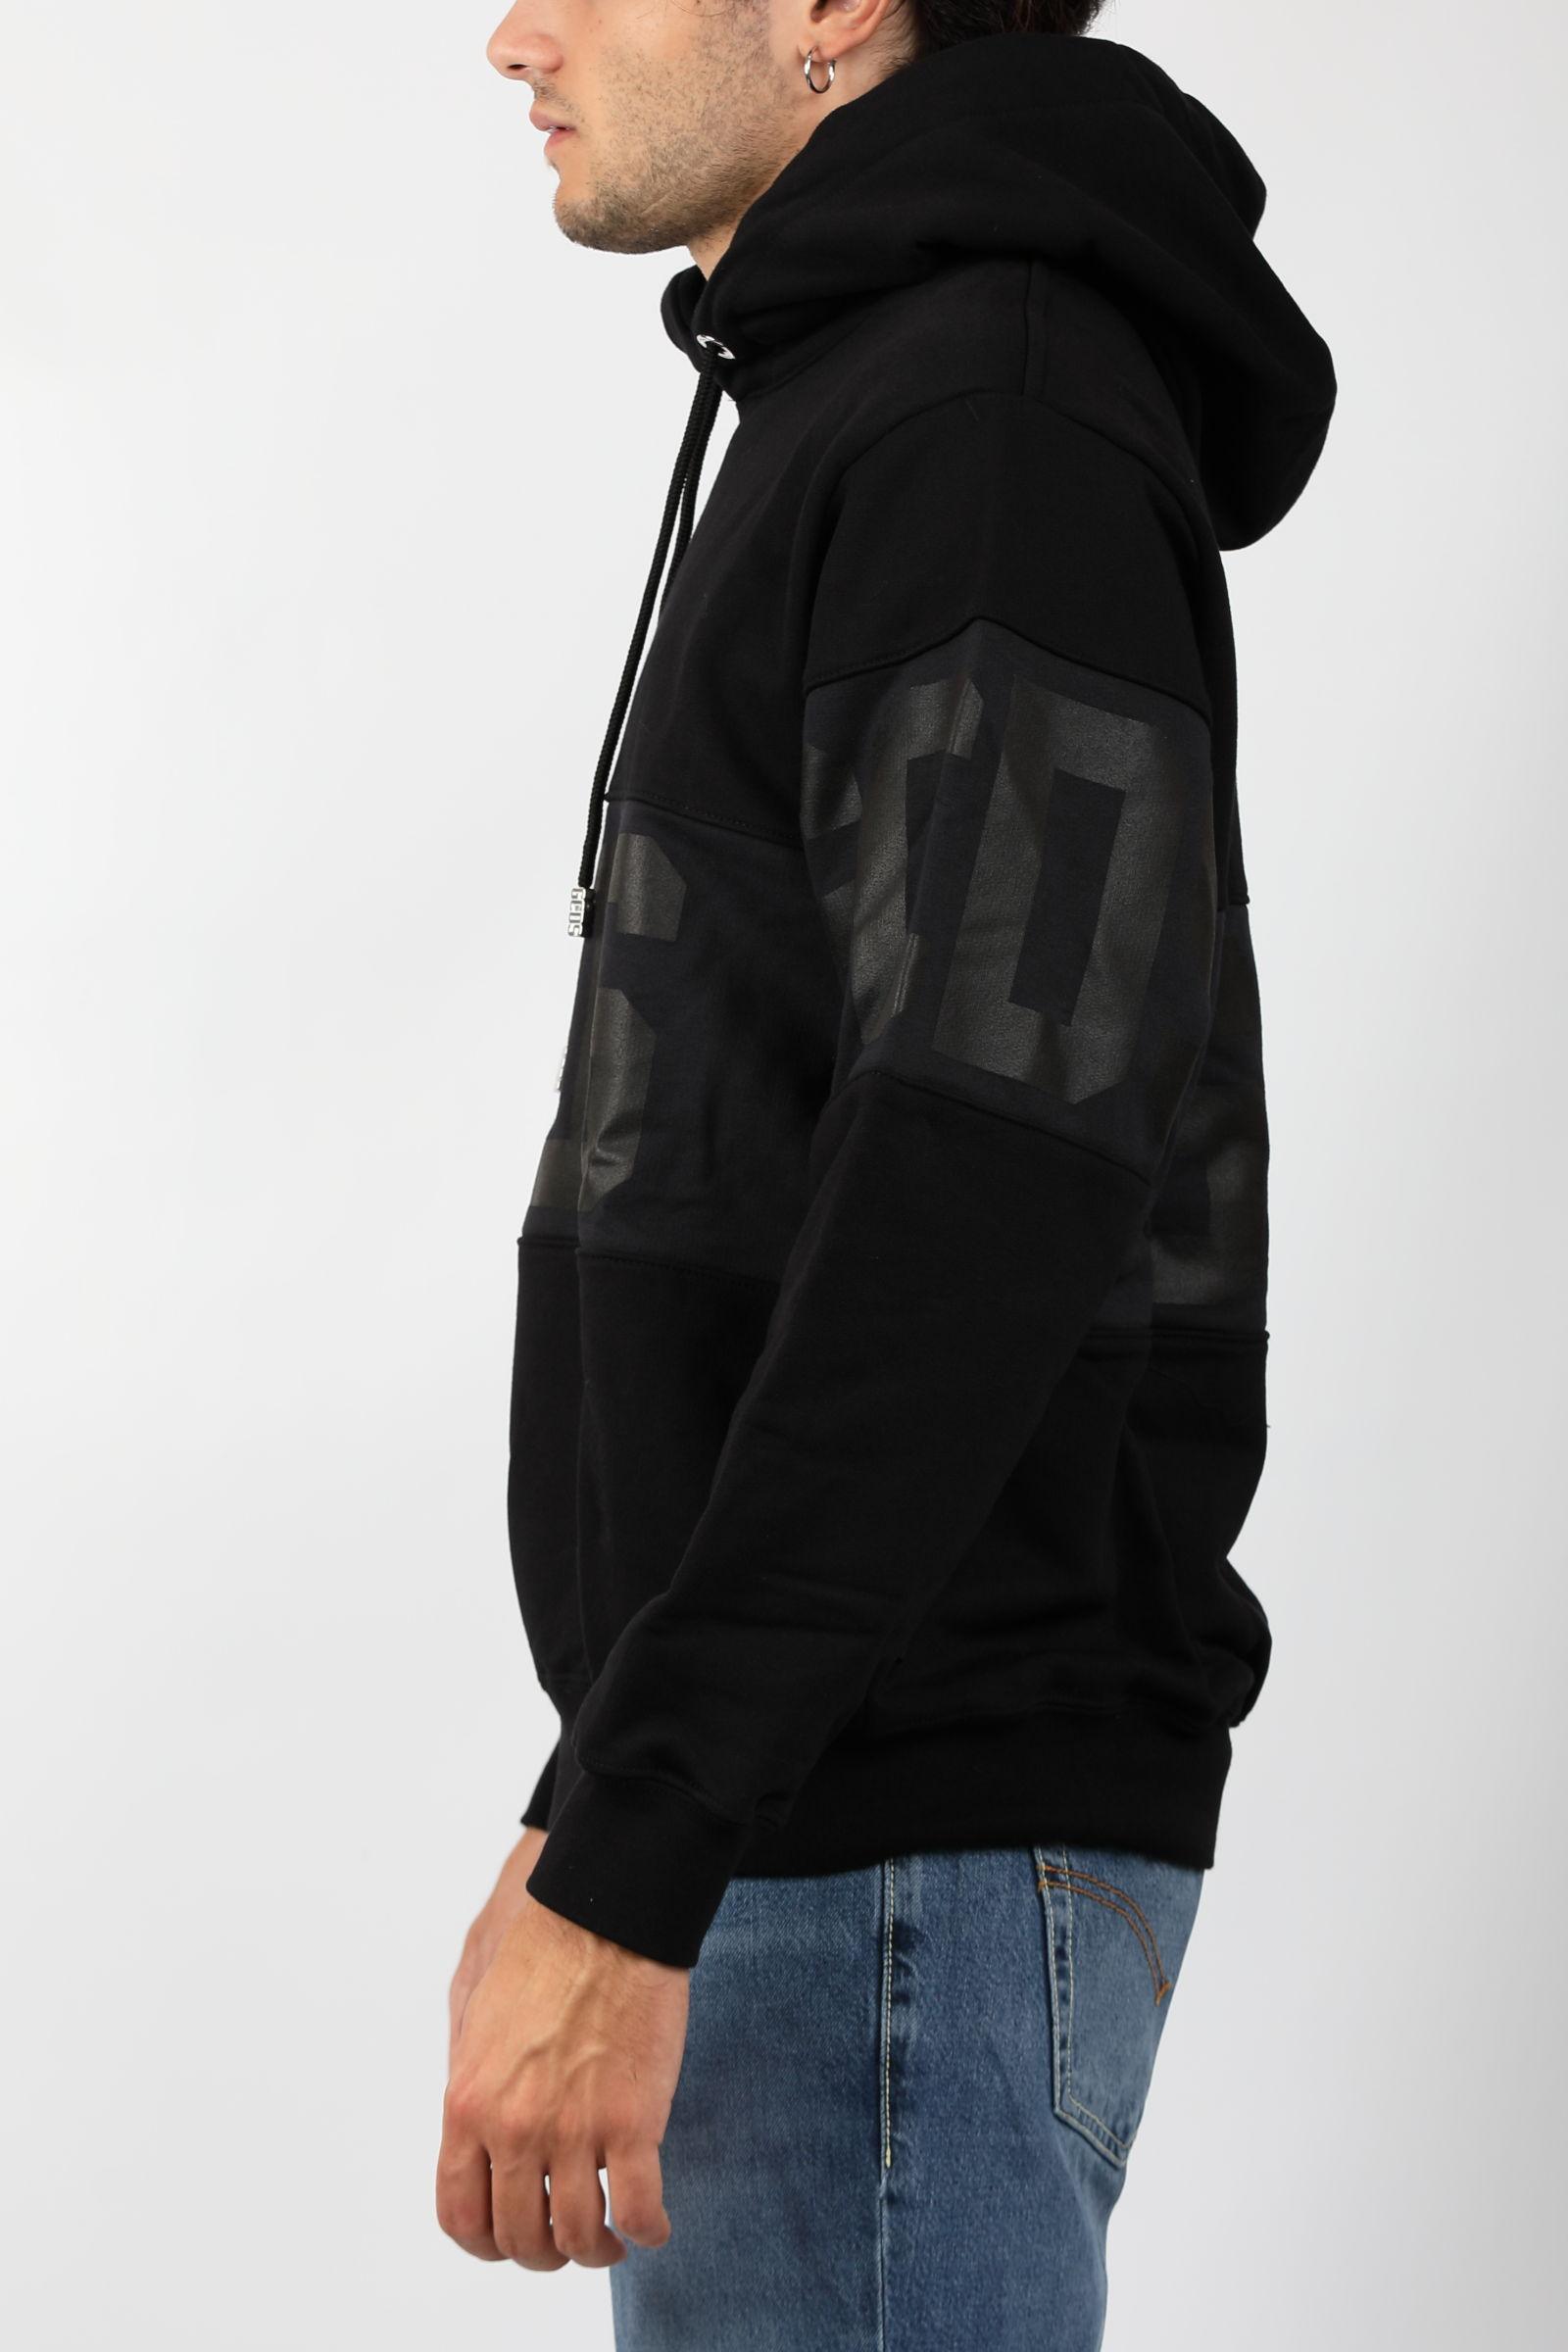 BAND LOGO HOODIE GCDS | Sweatshirts | CC94M02150302